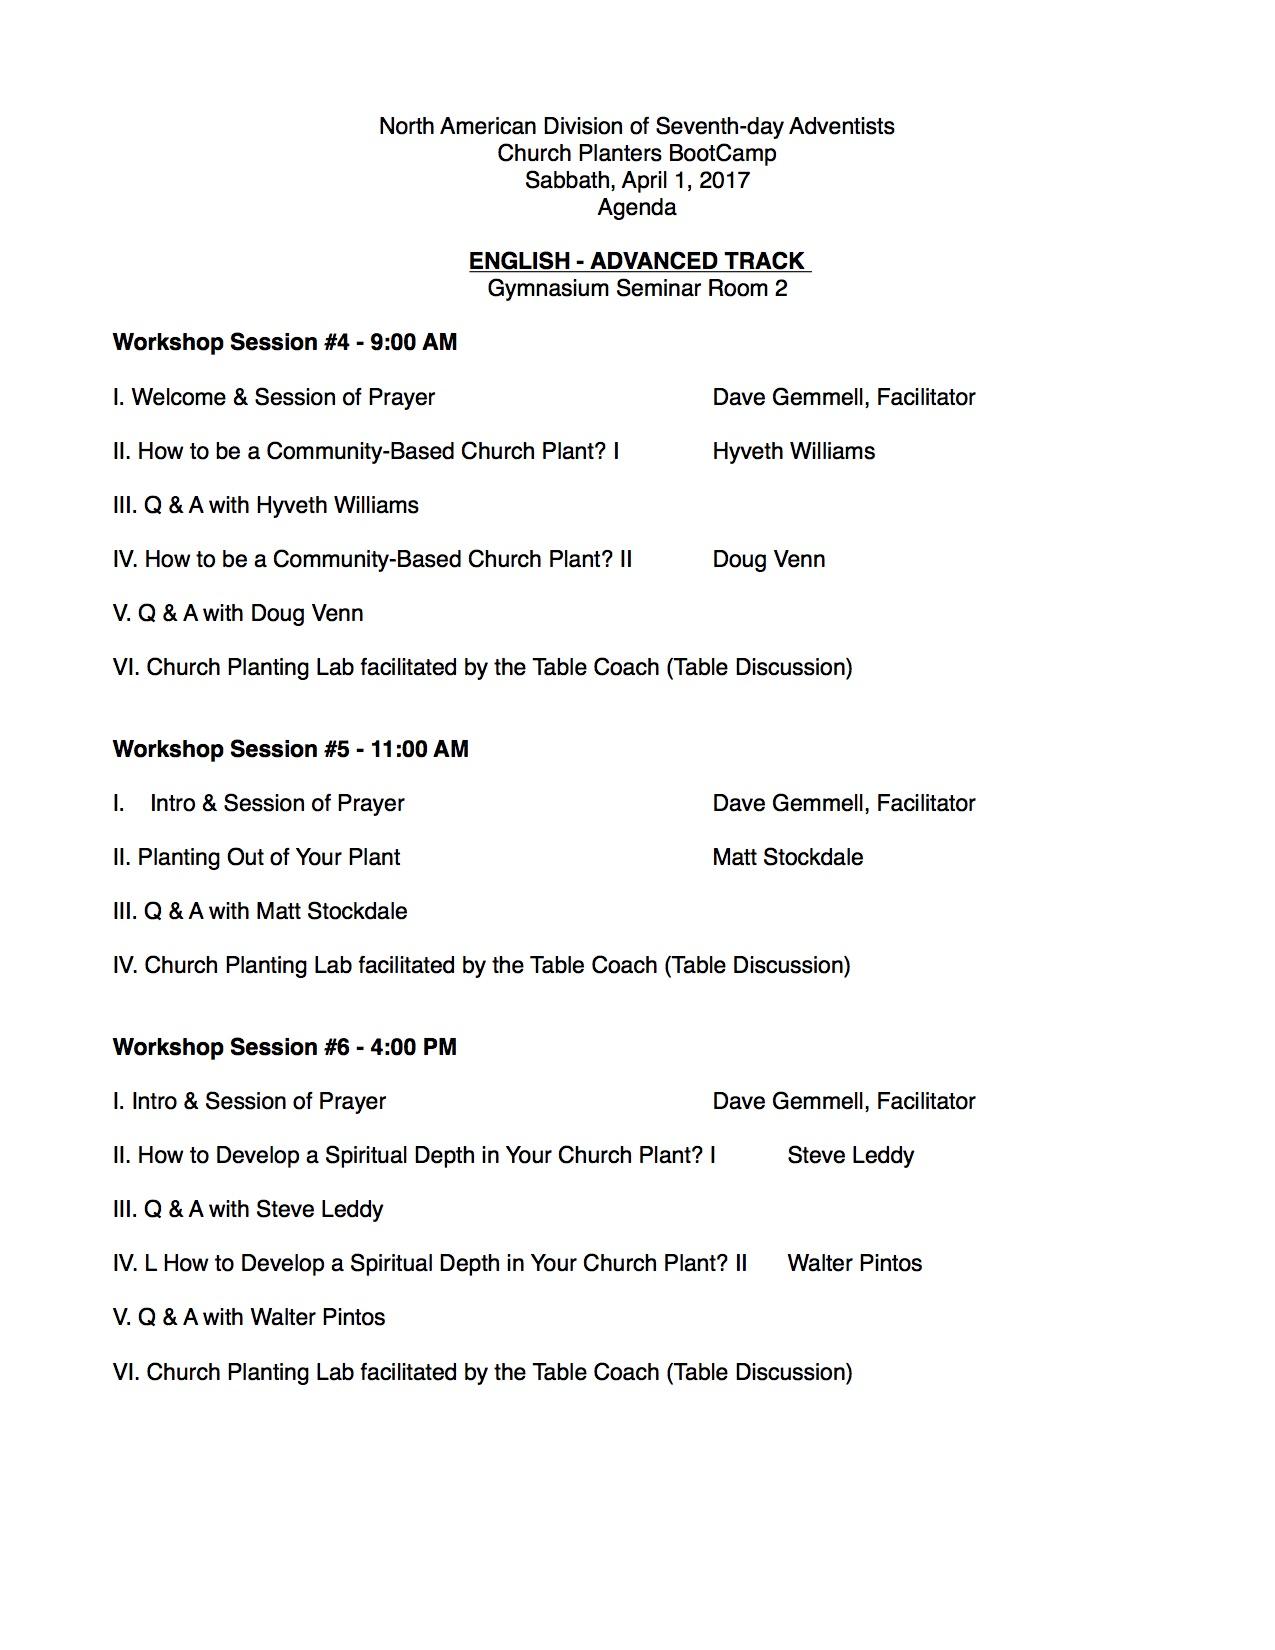 2017 Church Planters BootCamp Schedule & Presenters